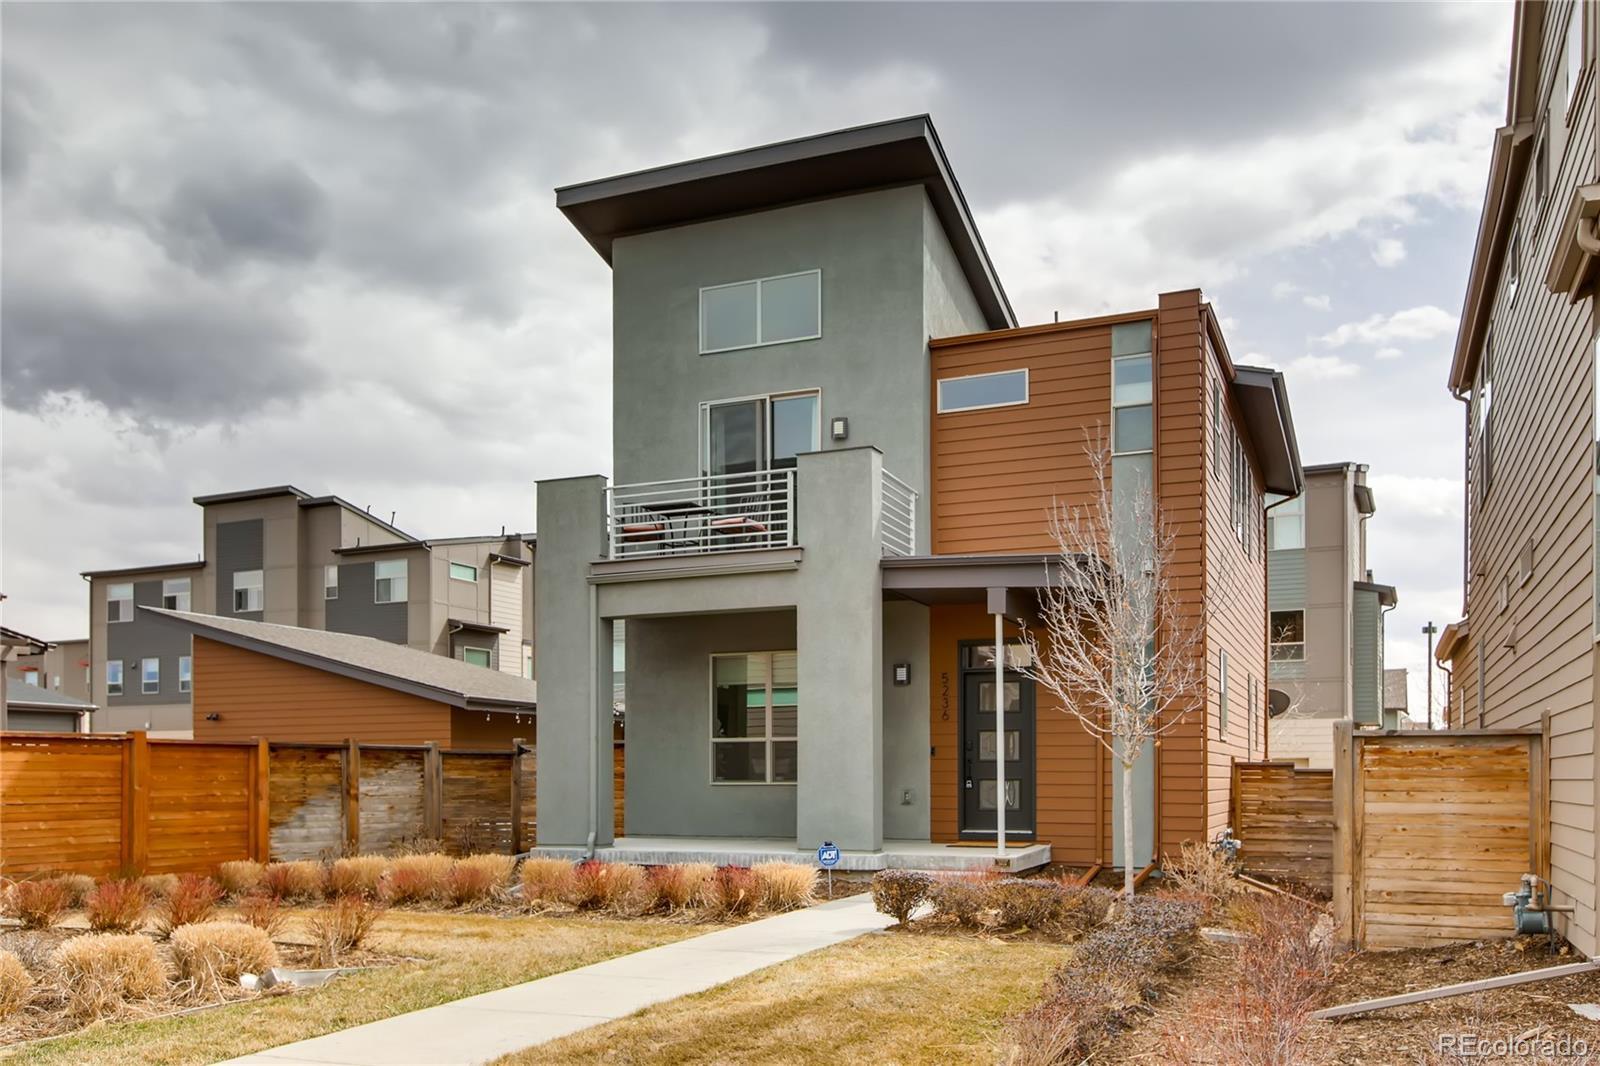 MLS# 6750540 - 2 - 5236 Akron Street, Denver, CO 80238